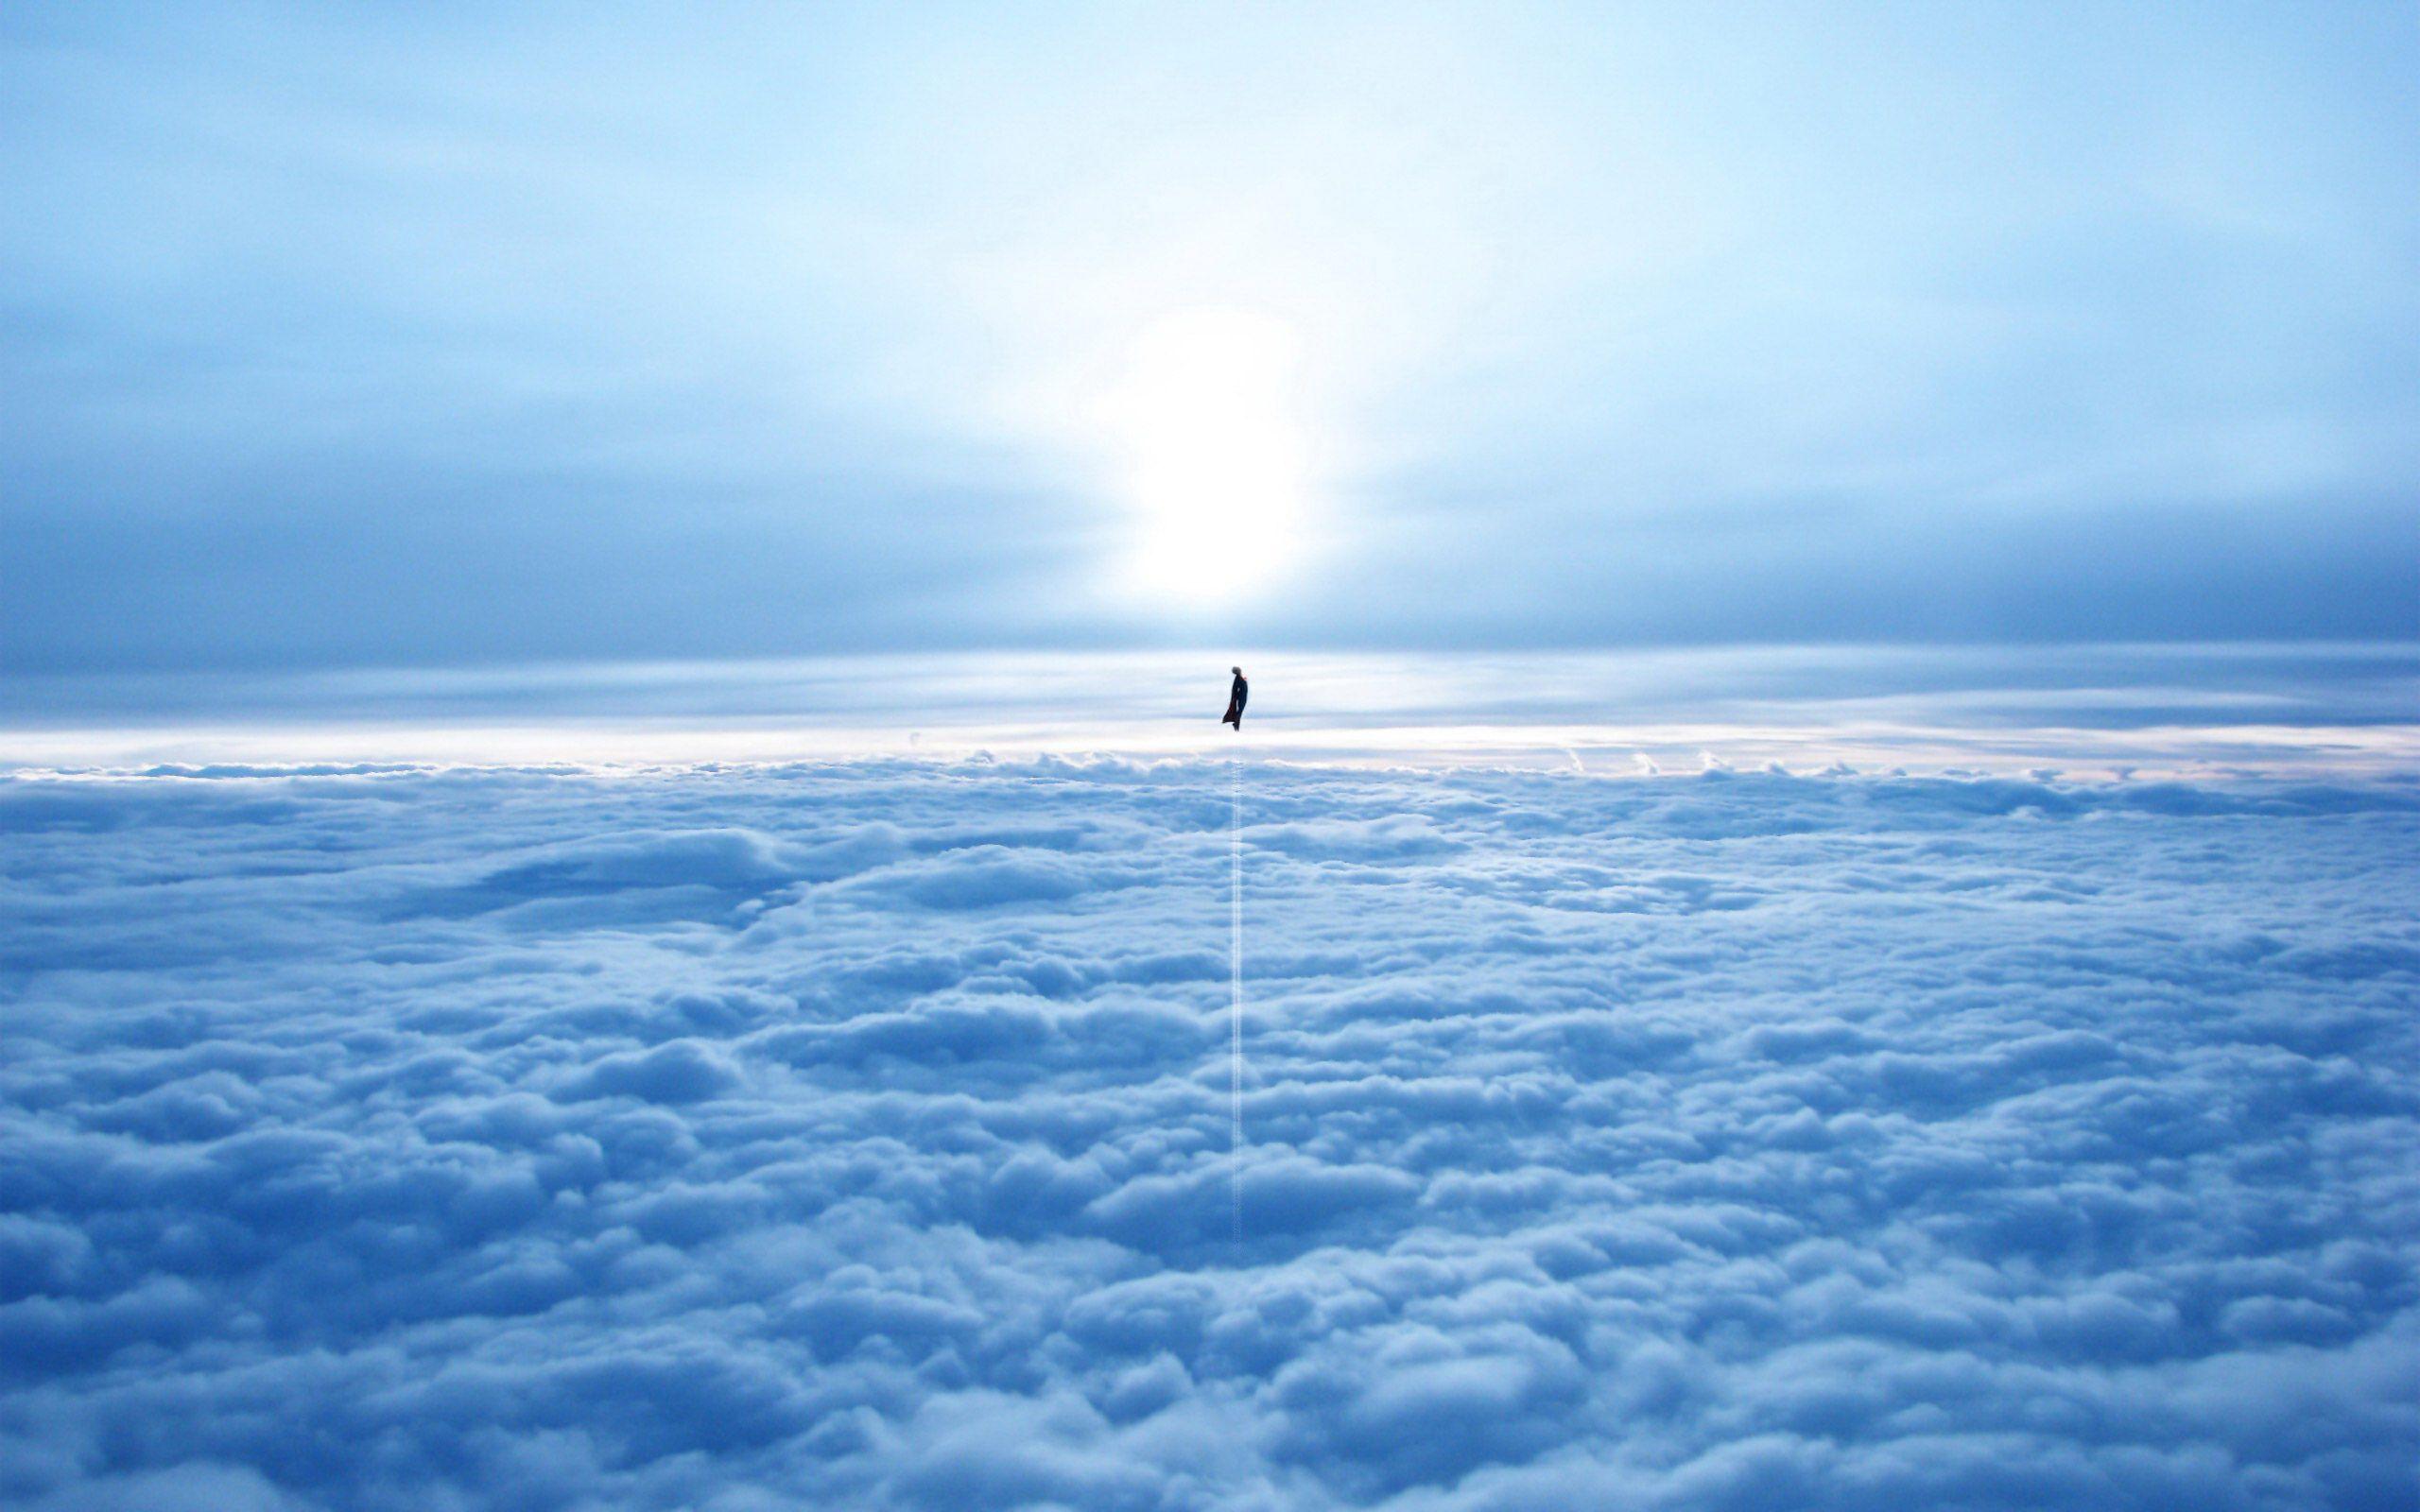 The Subtle Man Of Steel Heaven Wallpaper World Mythology Clouds